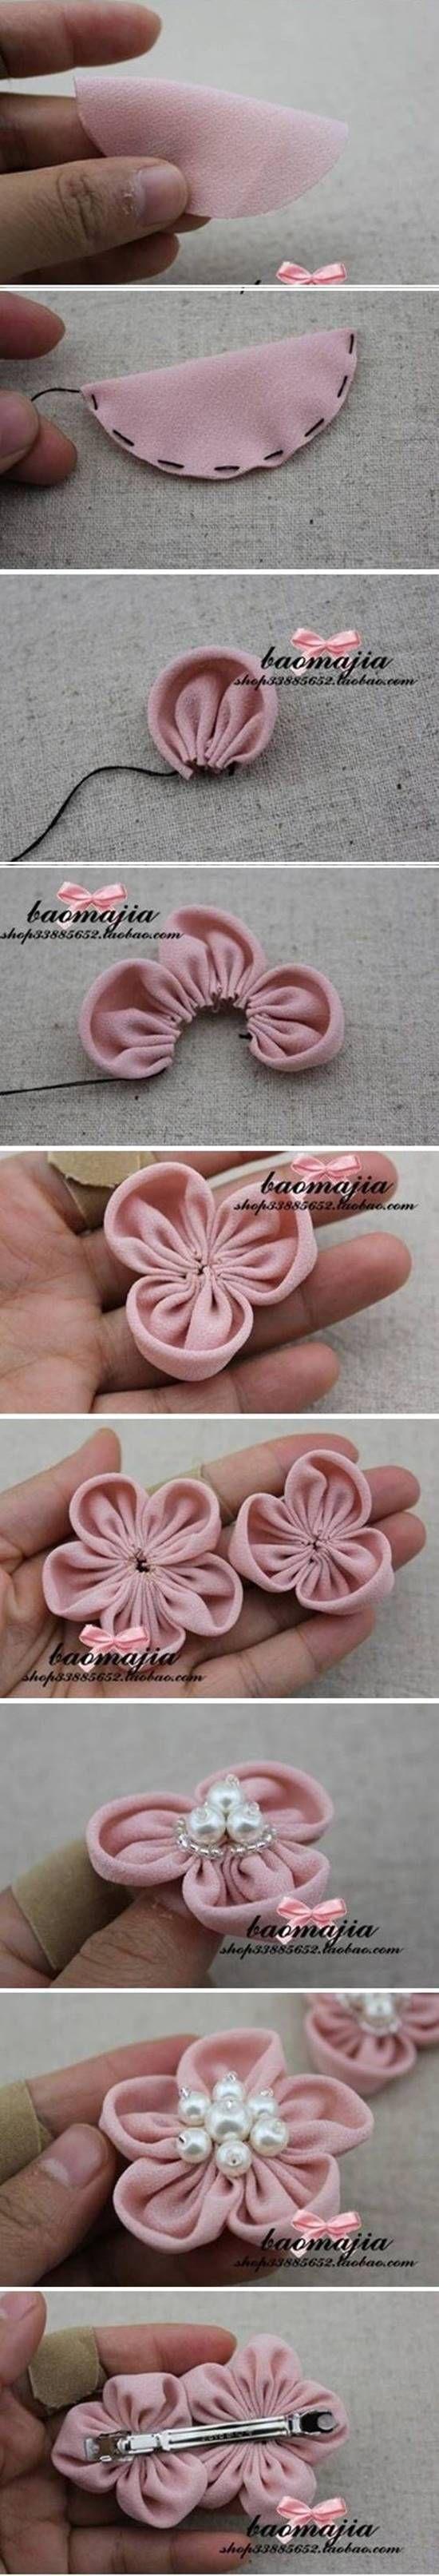 DIY Pretty Fabric Flower Hair Clip - #hairclips